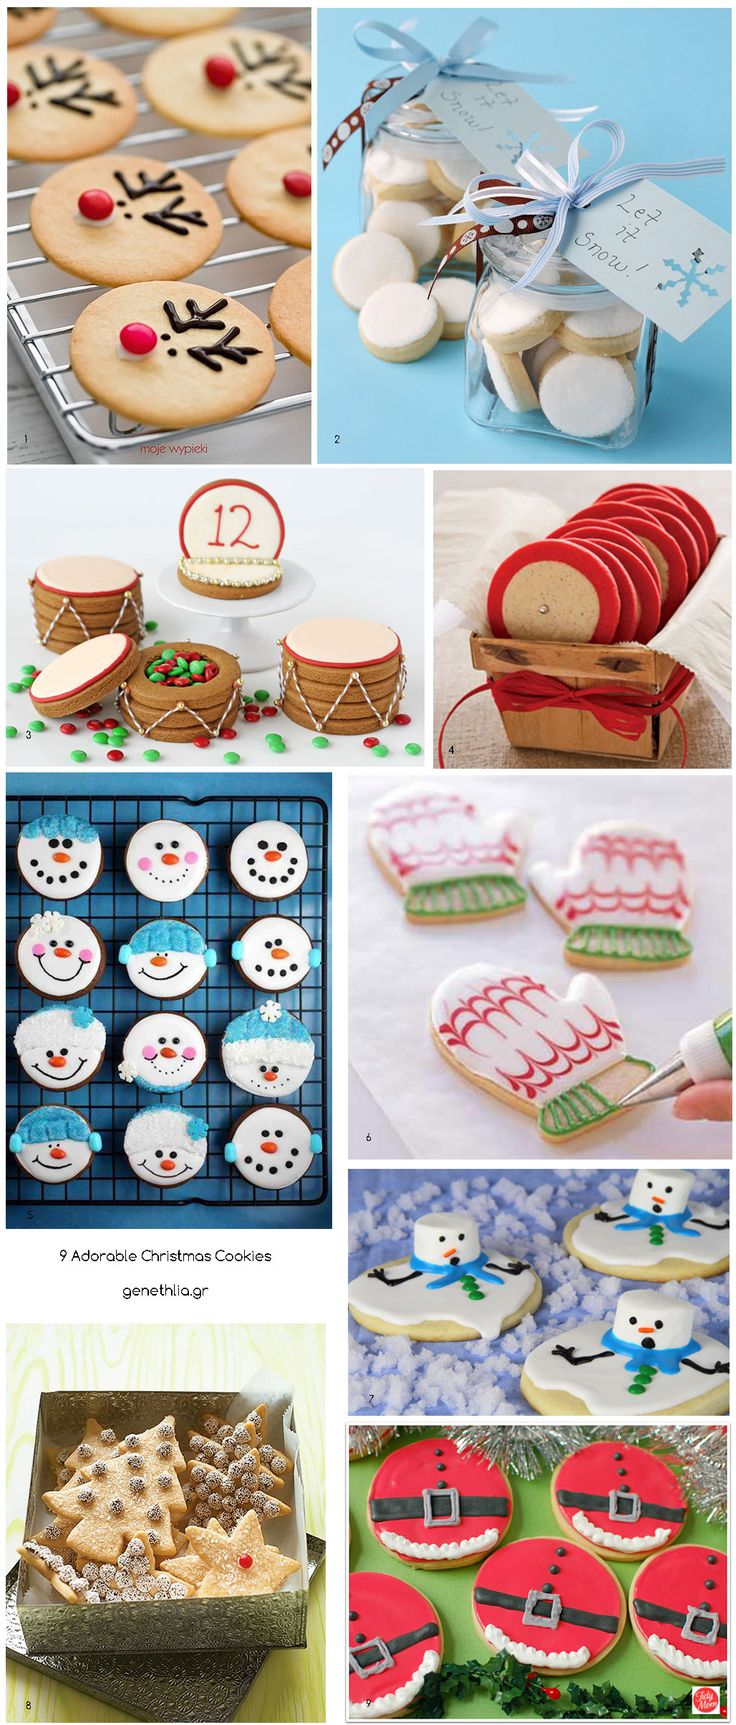 9 Adorable Christmas Cookies Ideas- 9 Ιδέες για καταπληκτικά χριστουγεννιατικα μπισκοτα